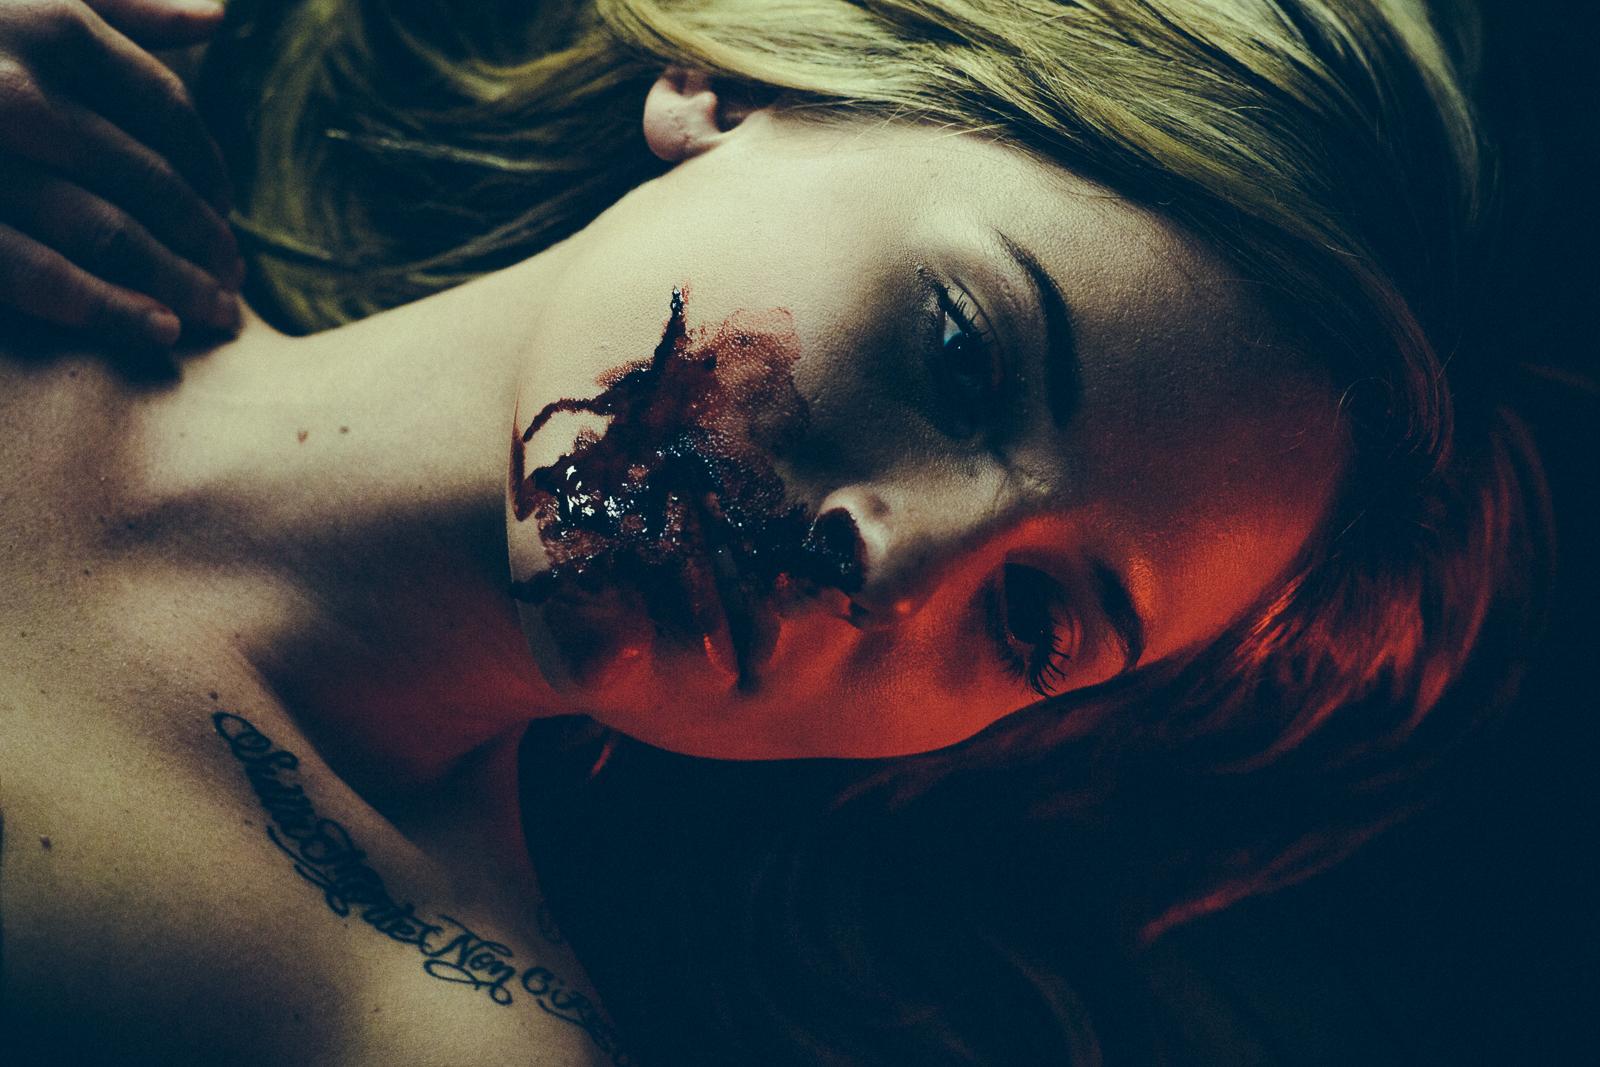 Alina. Blood Session. Photo by Flavio Scorsato